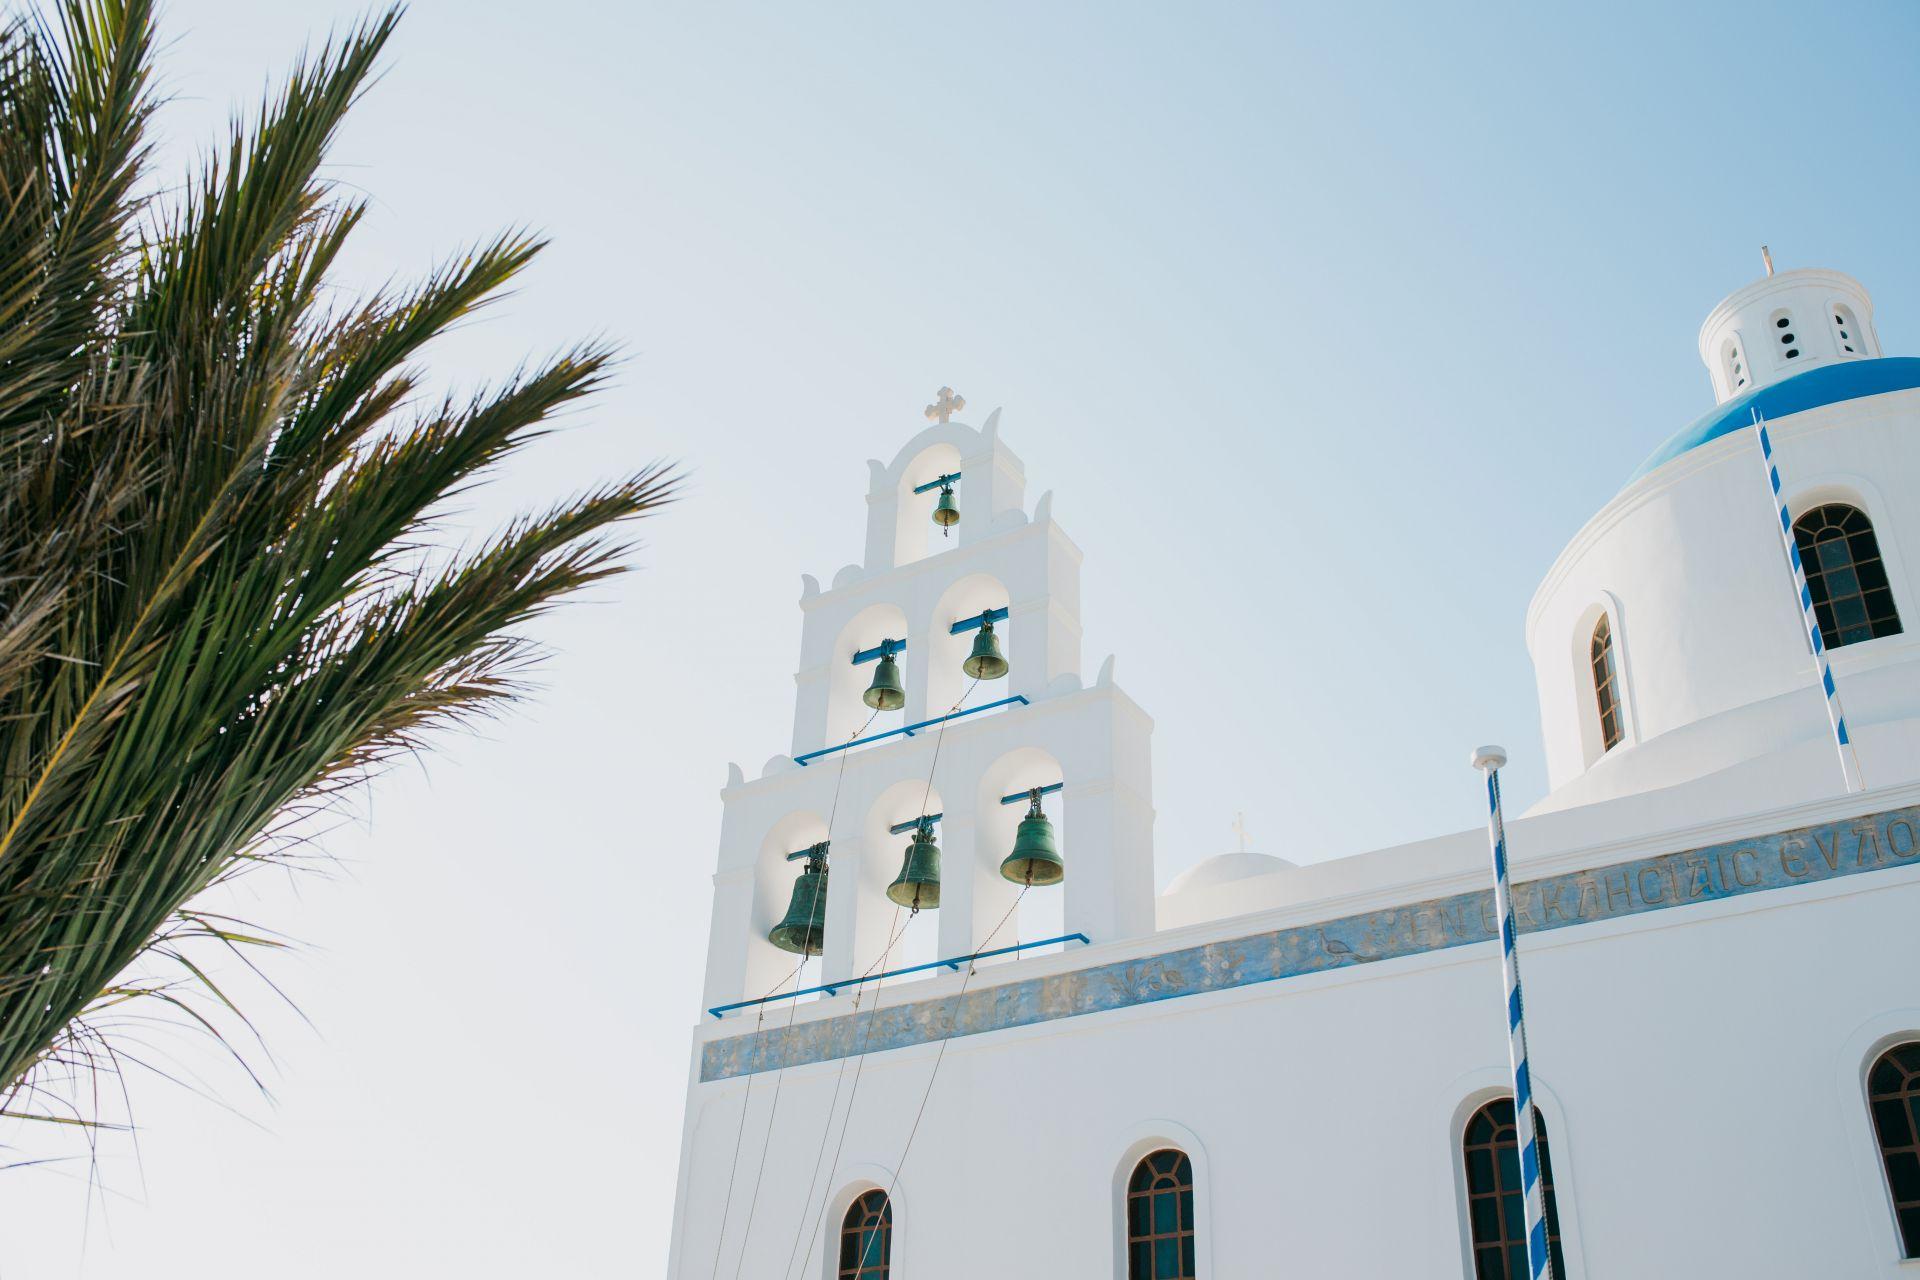 Oia, Summer in Santorini | SarahMichiko.com